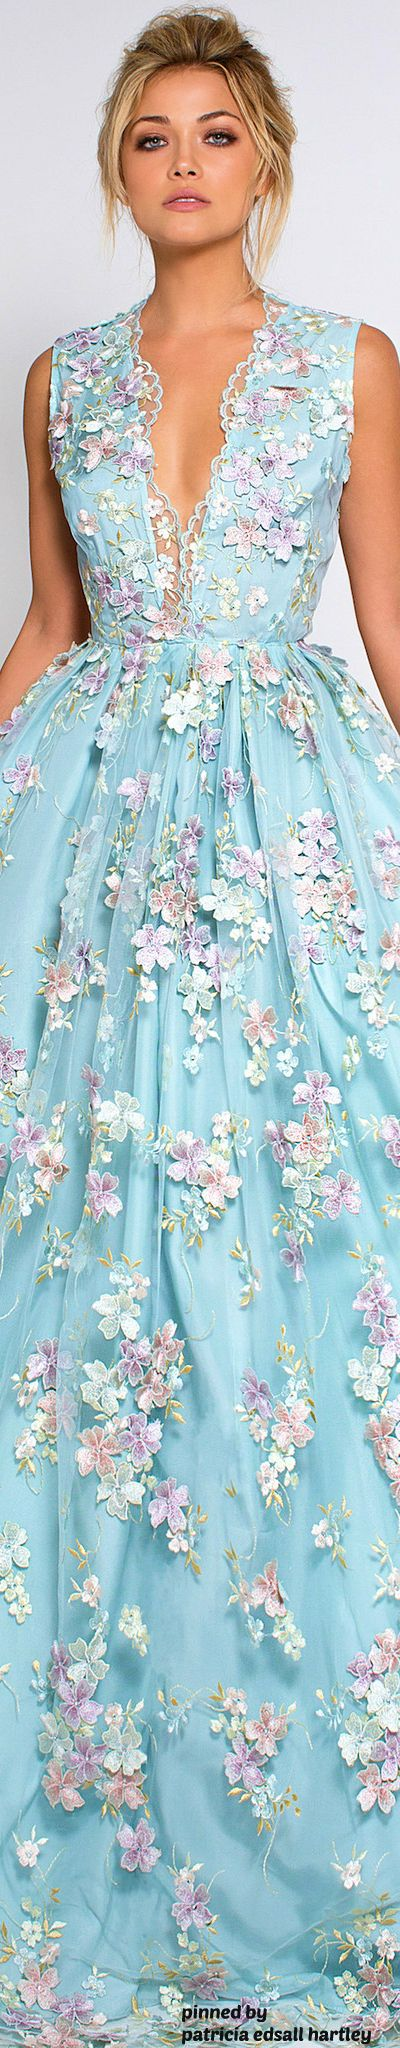 best blue dress lia itu tiwi images on Pinterest High fashion